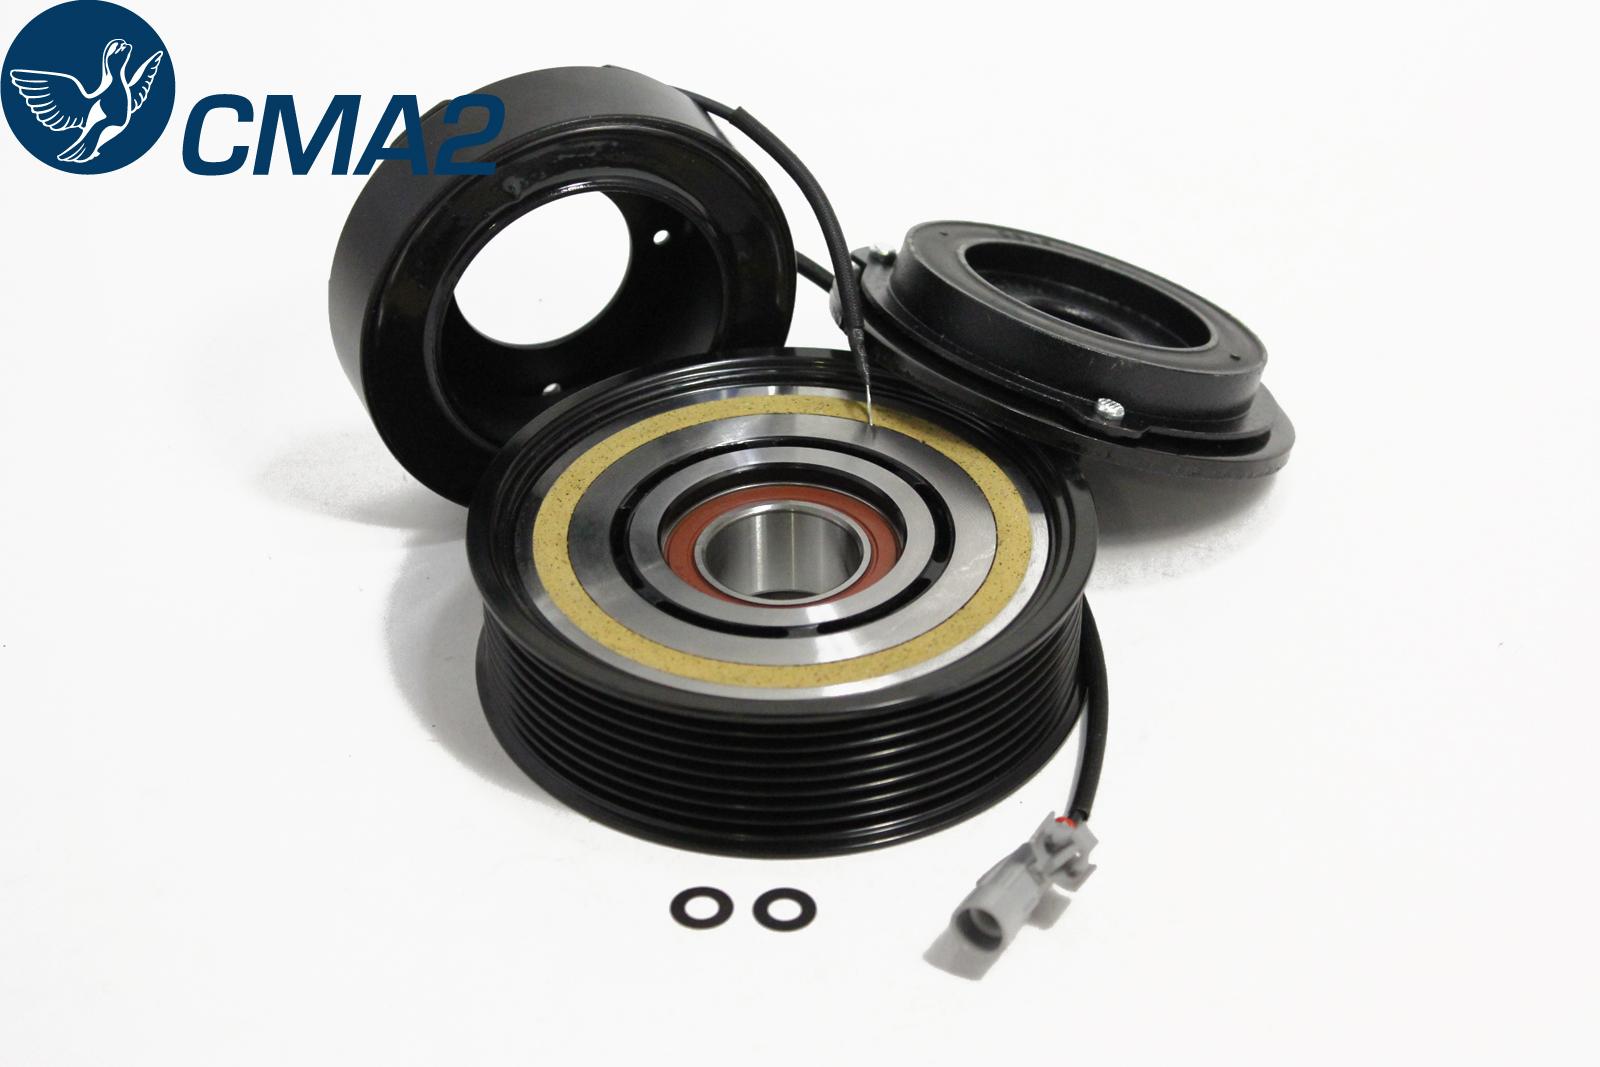 Муфта компрессора кондиционера Тойота Тундра, 88410-0C080, 884100C080.